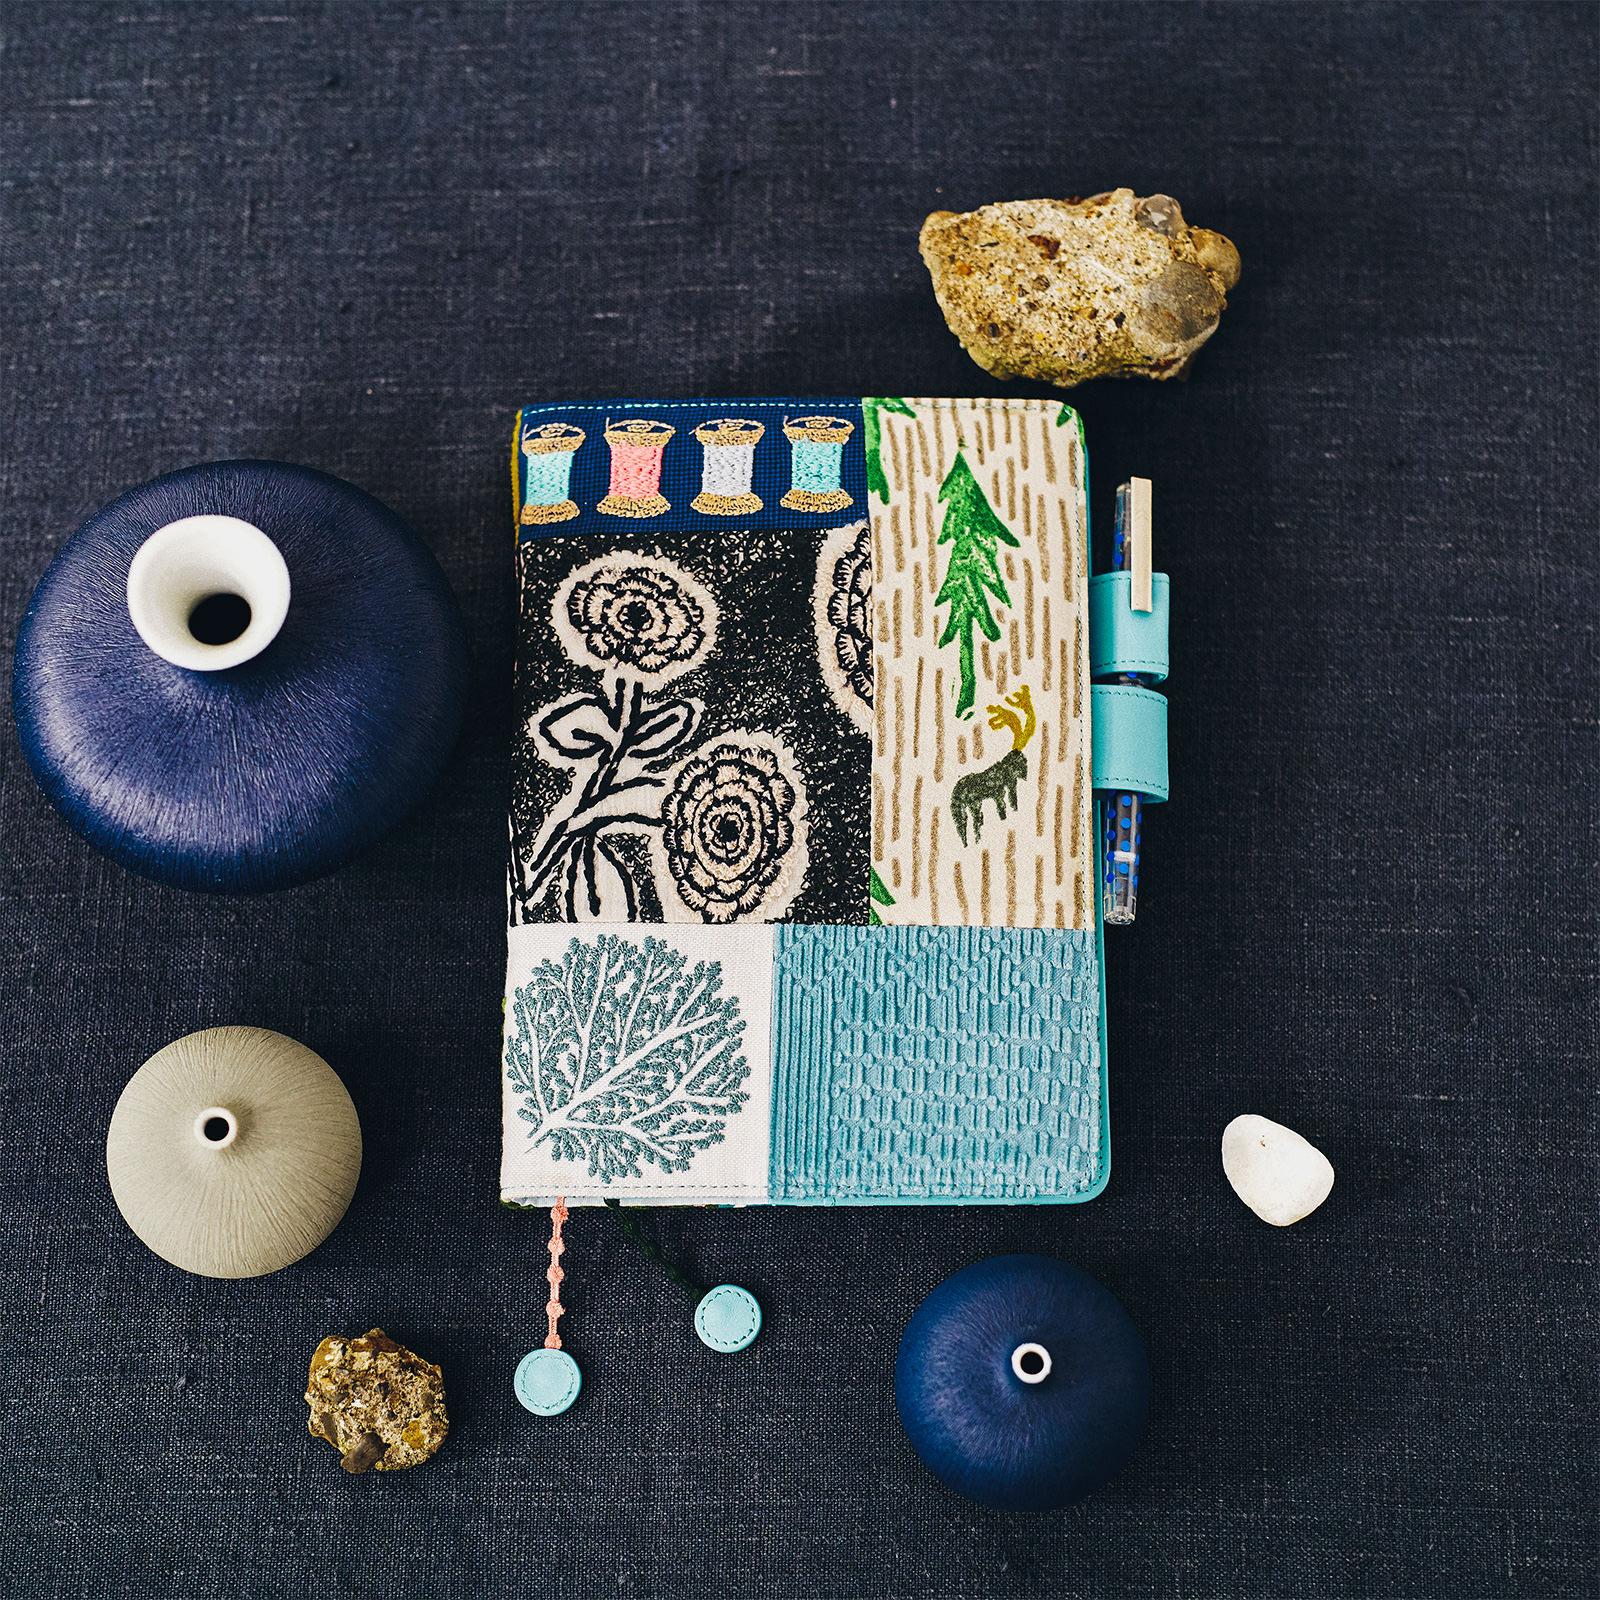 Details about  /Hobonichi Original A5 size notebook cover soda water patternd by Mina Perhonen